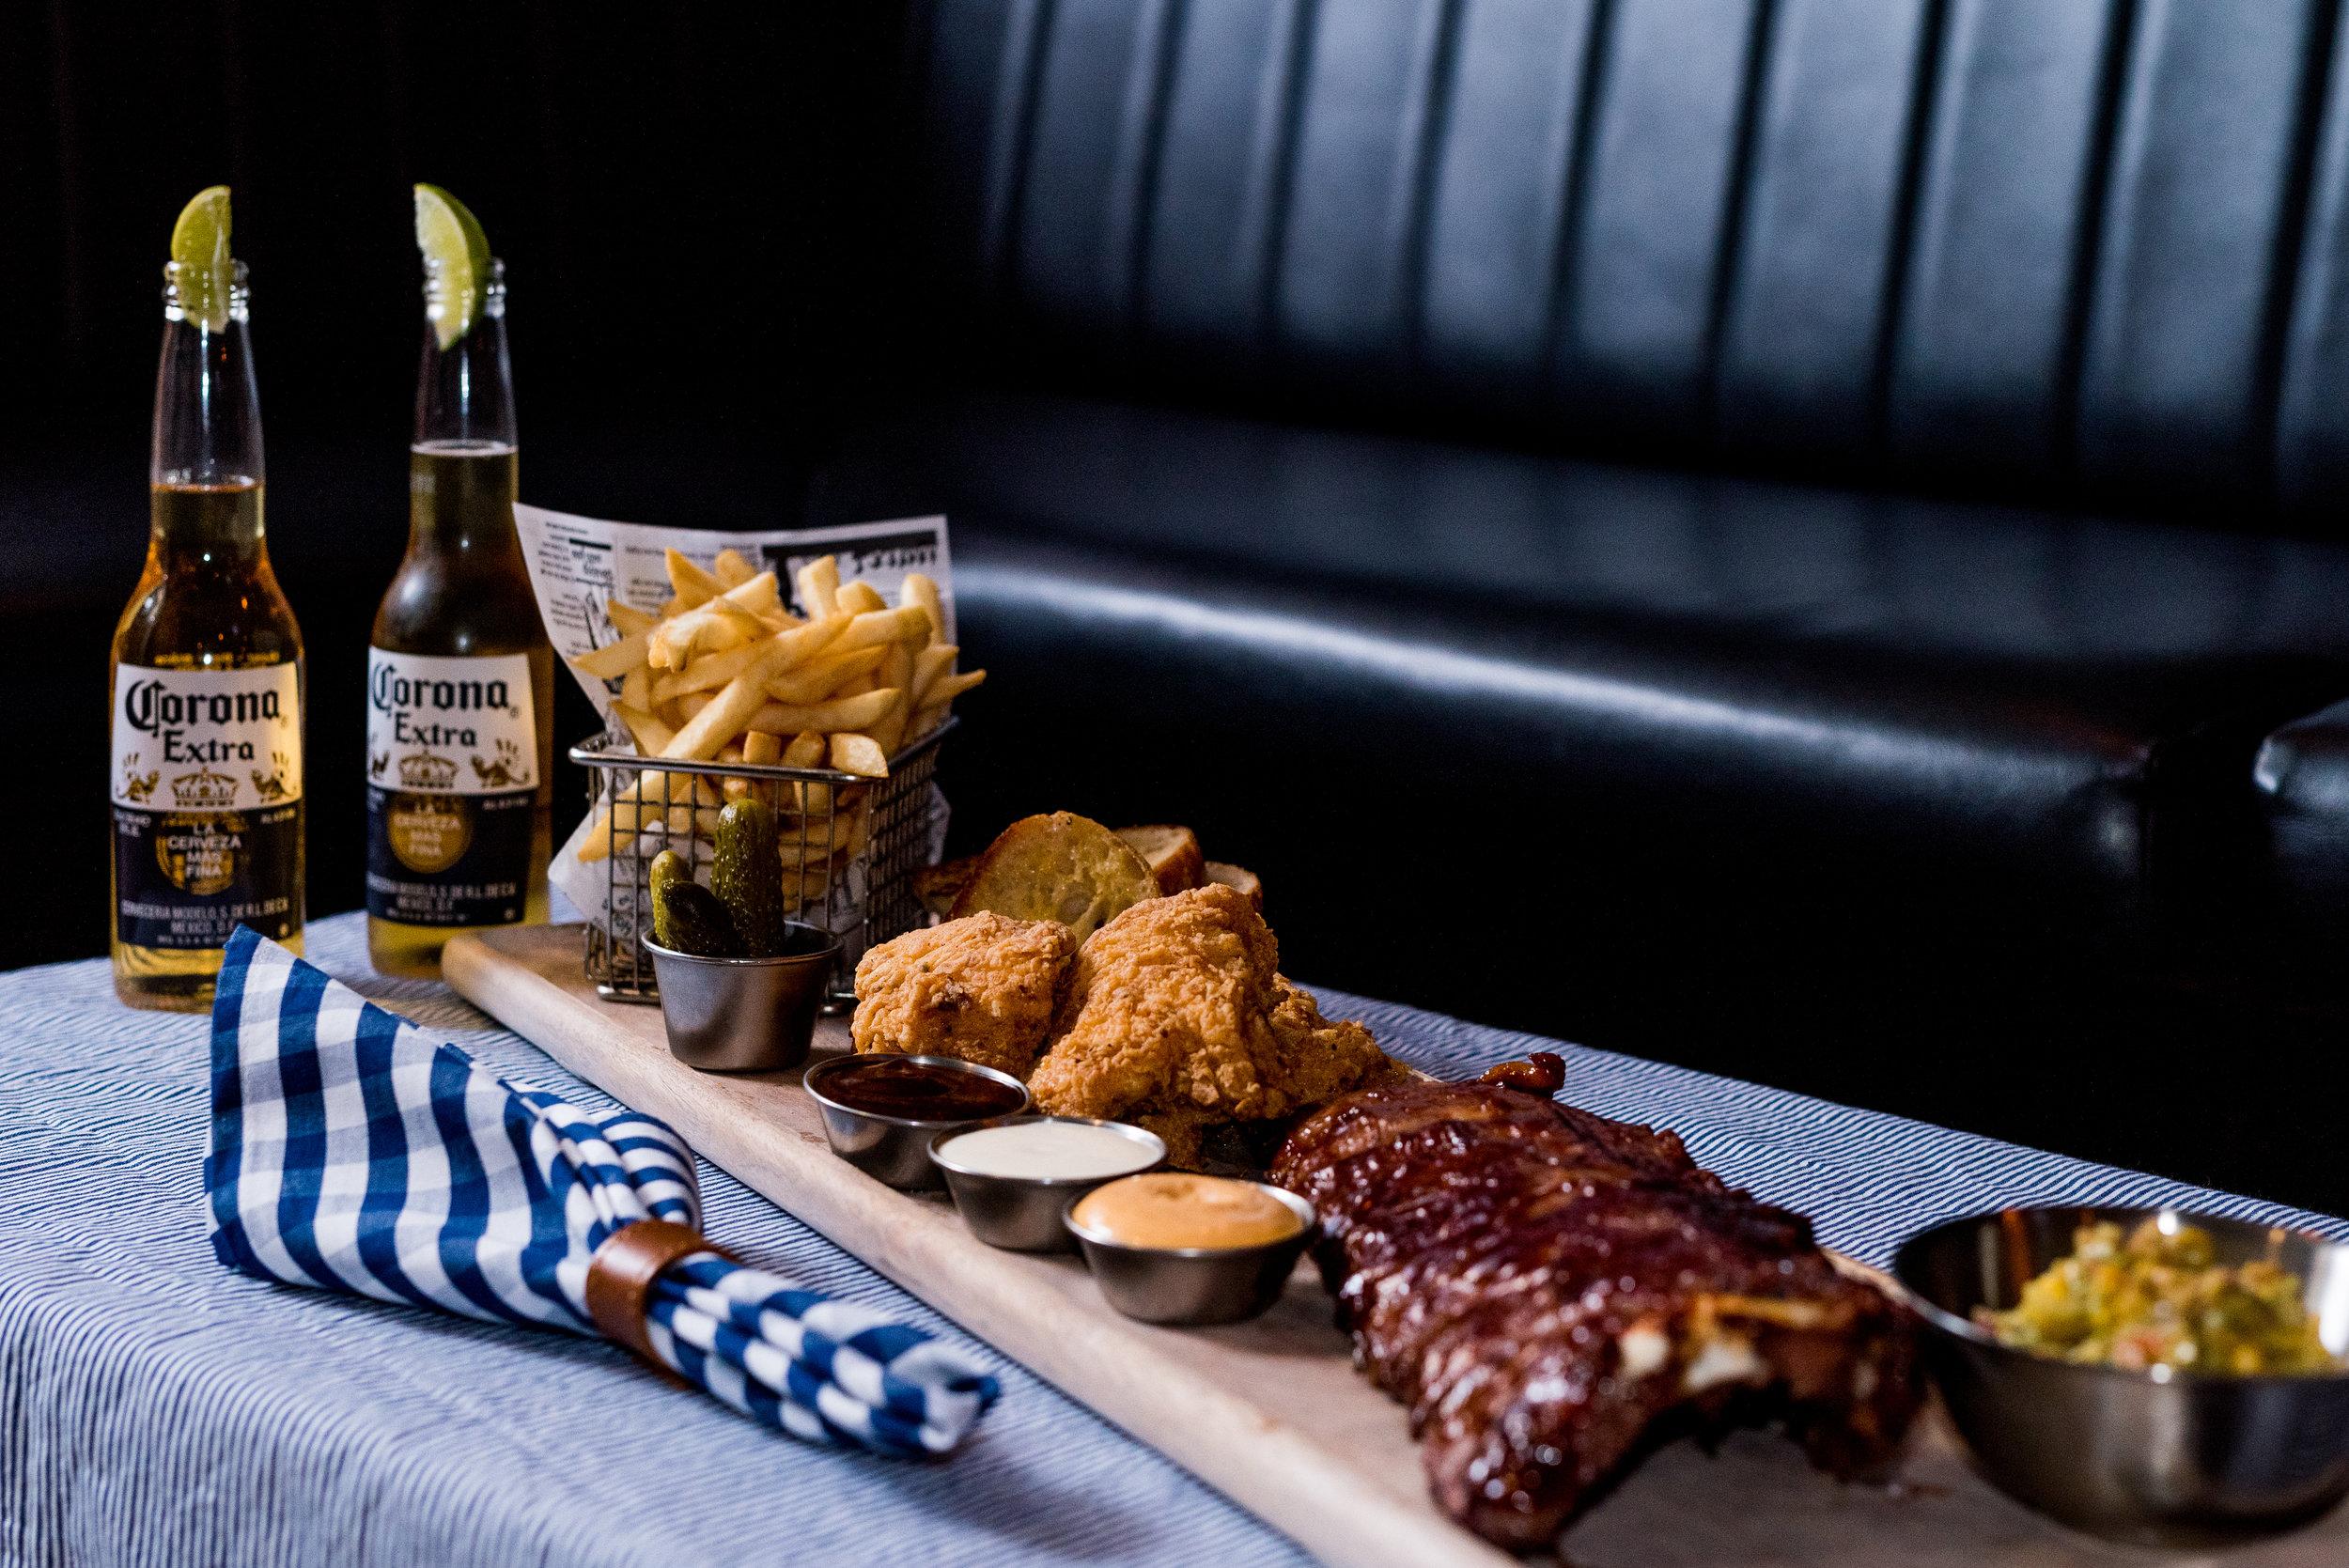 MENU - One of Sydney's best pub menu's.Burgers - ribs - wings & late night pizza